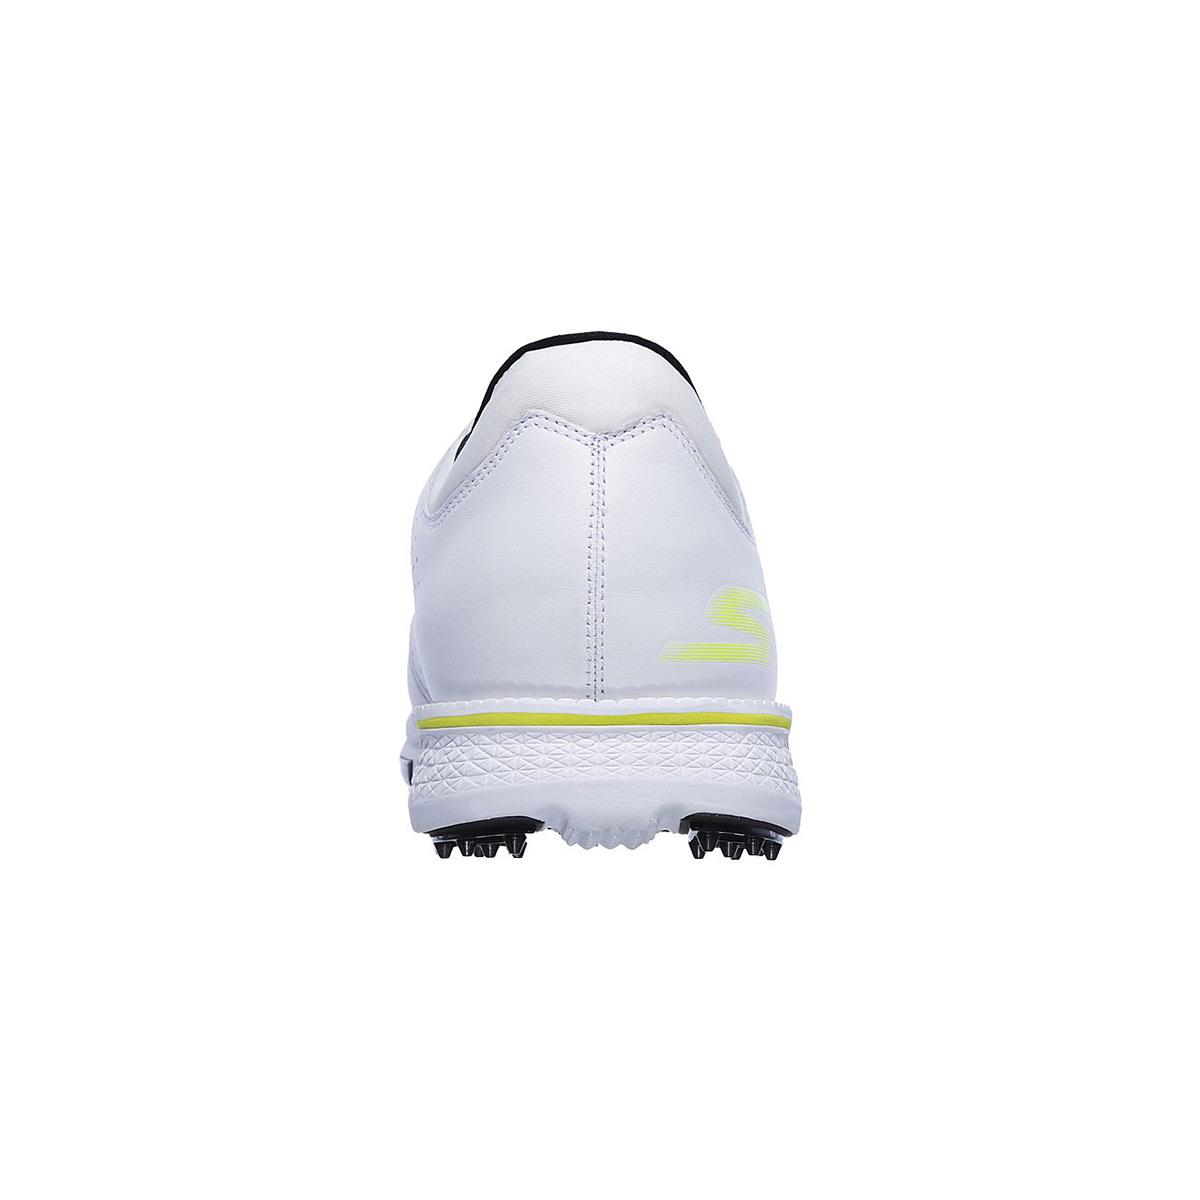 Skechers-Golf-Mens-2019-Go-Elite-V-3-Spikeless-Waterproof-Leather-Golf-Shoes thumbnail 13